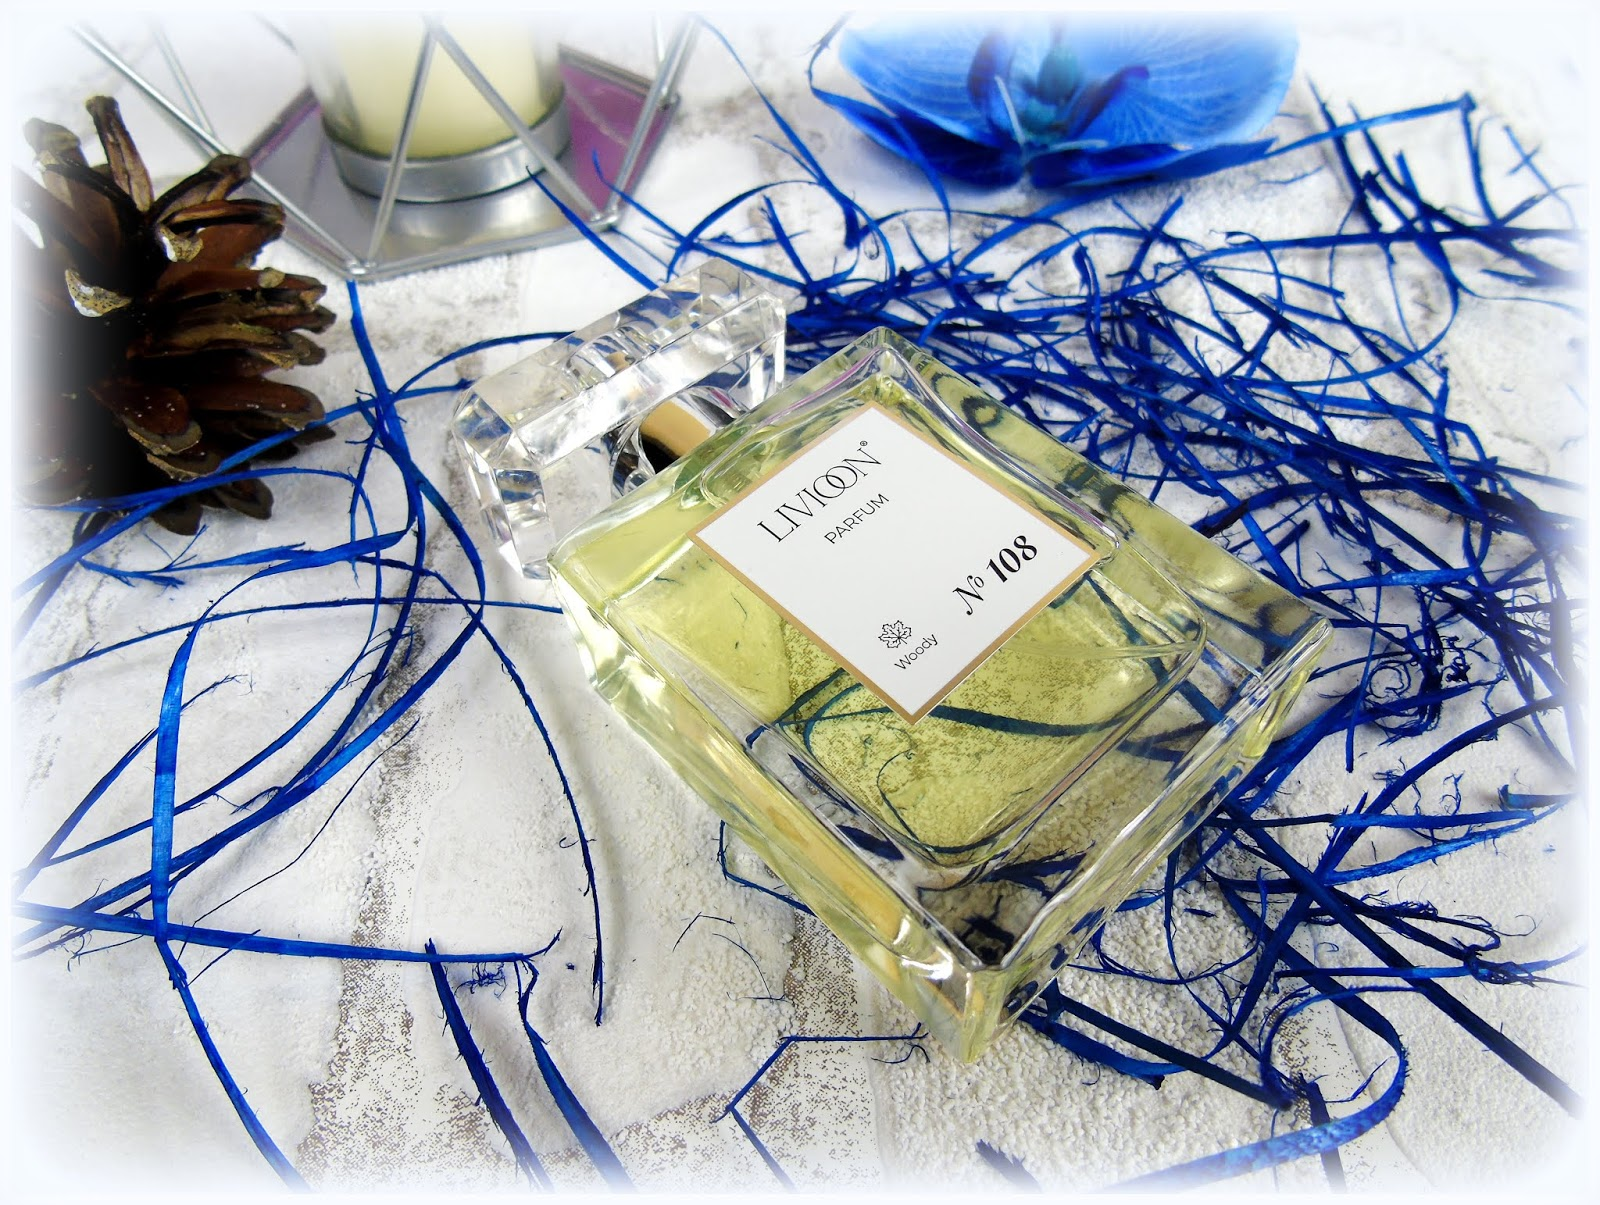 Perfumy nr 108 od LIVIOON - ten zapach uzależnia!